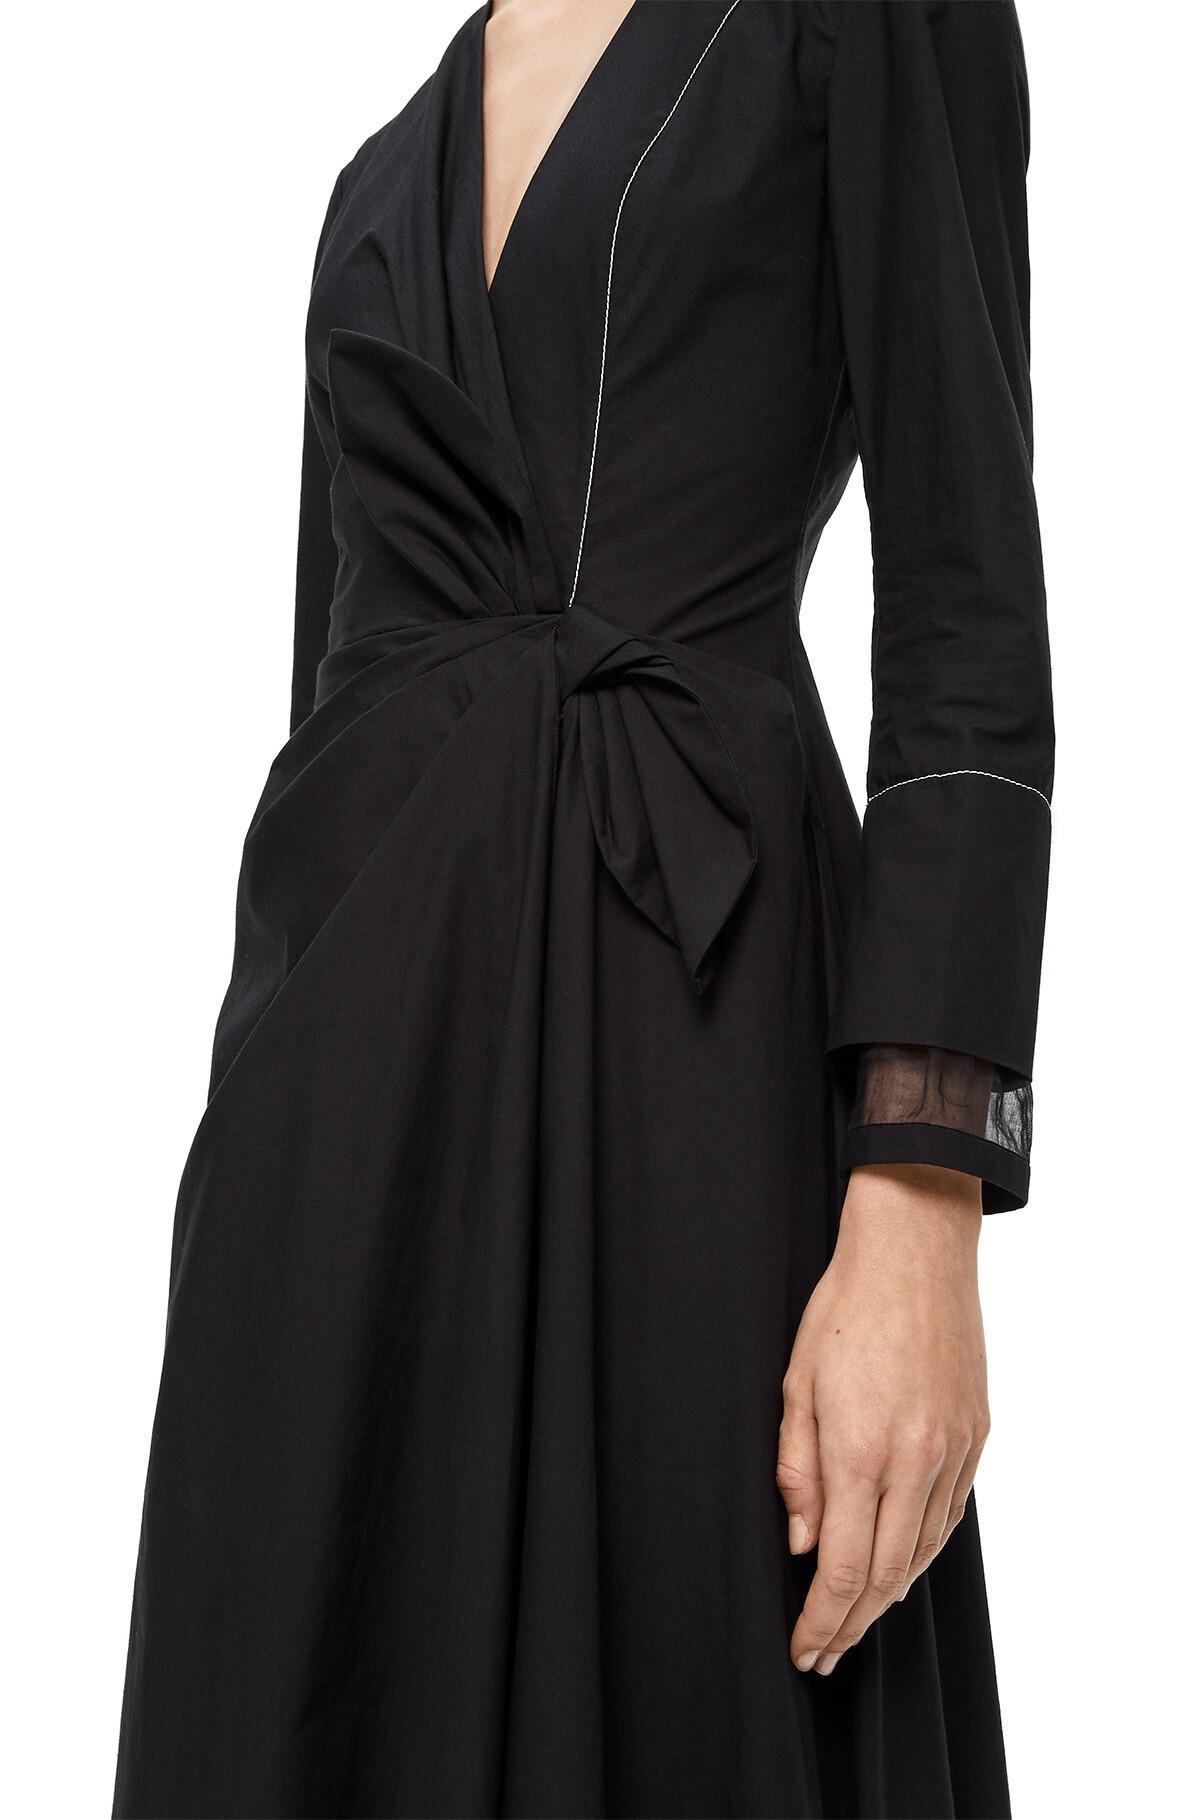 LOEWE Gathered Dress Black front